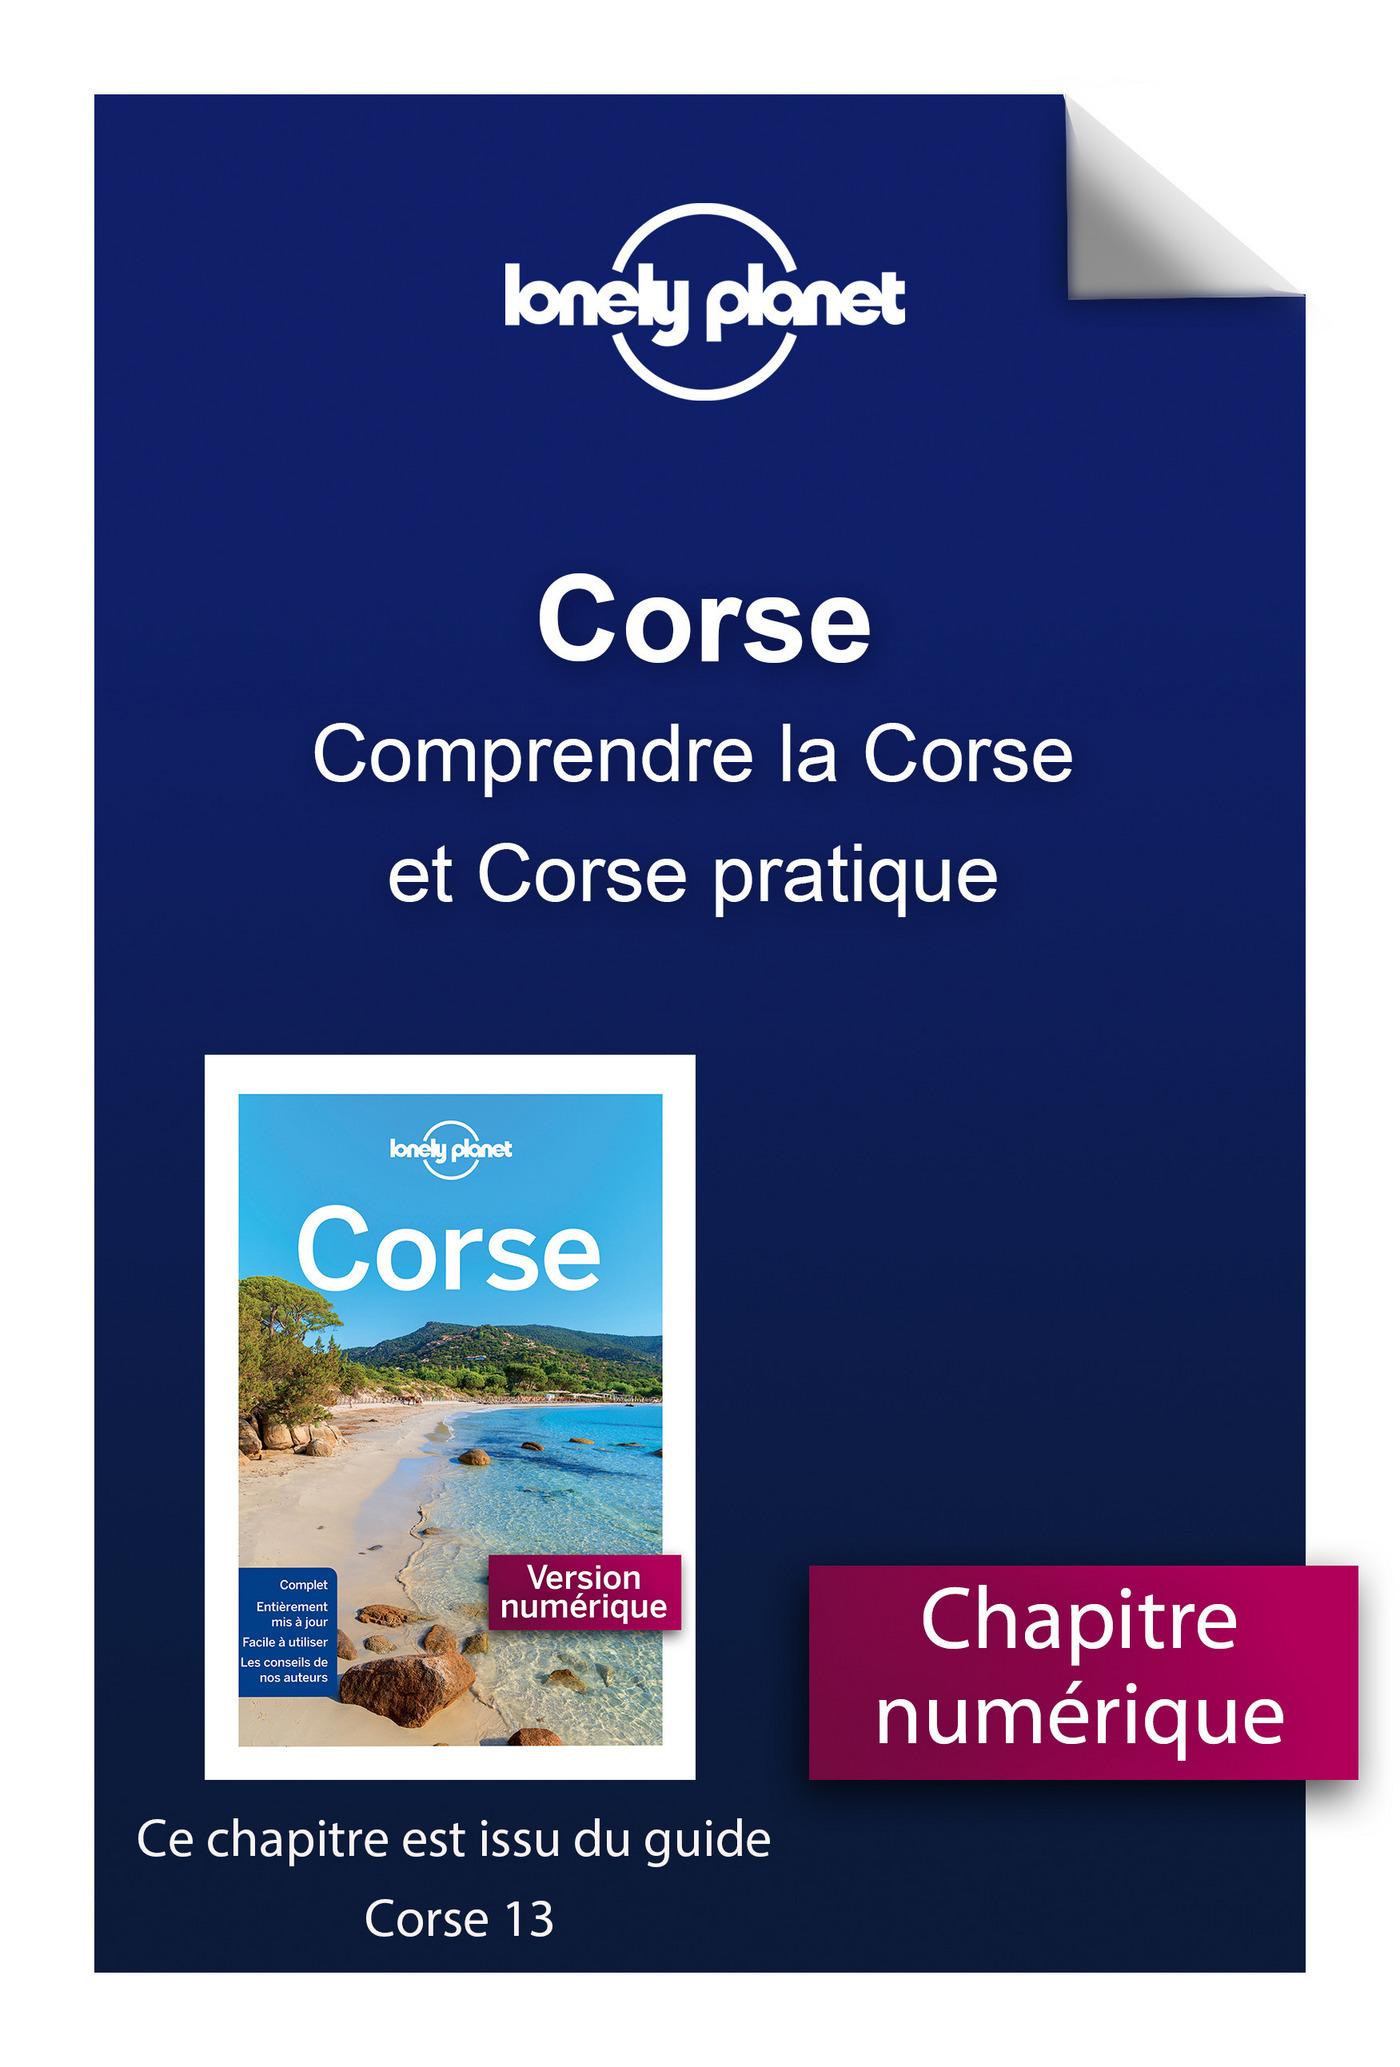 Corse - Comprendre la Corse et Corse pratique